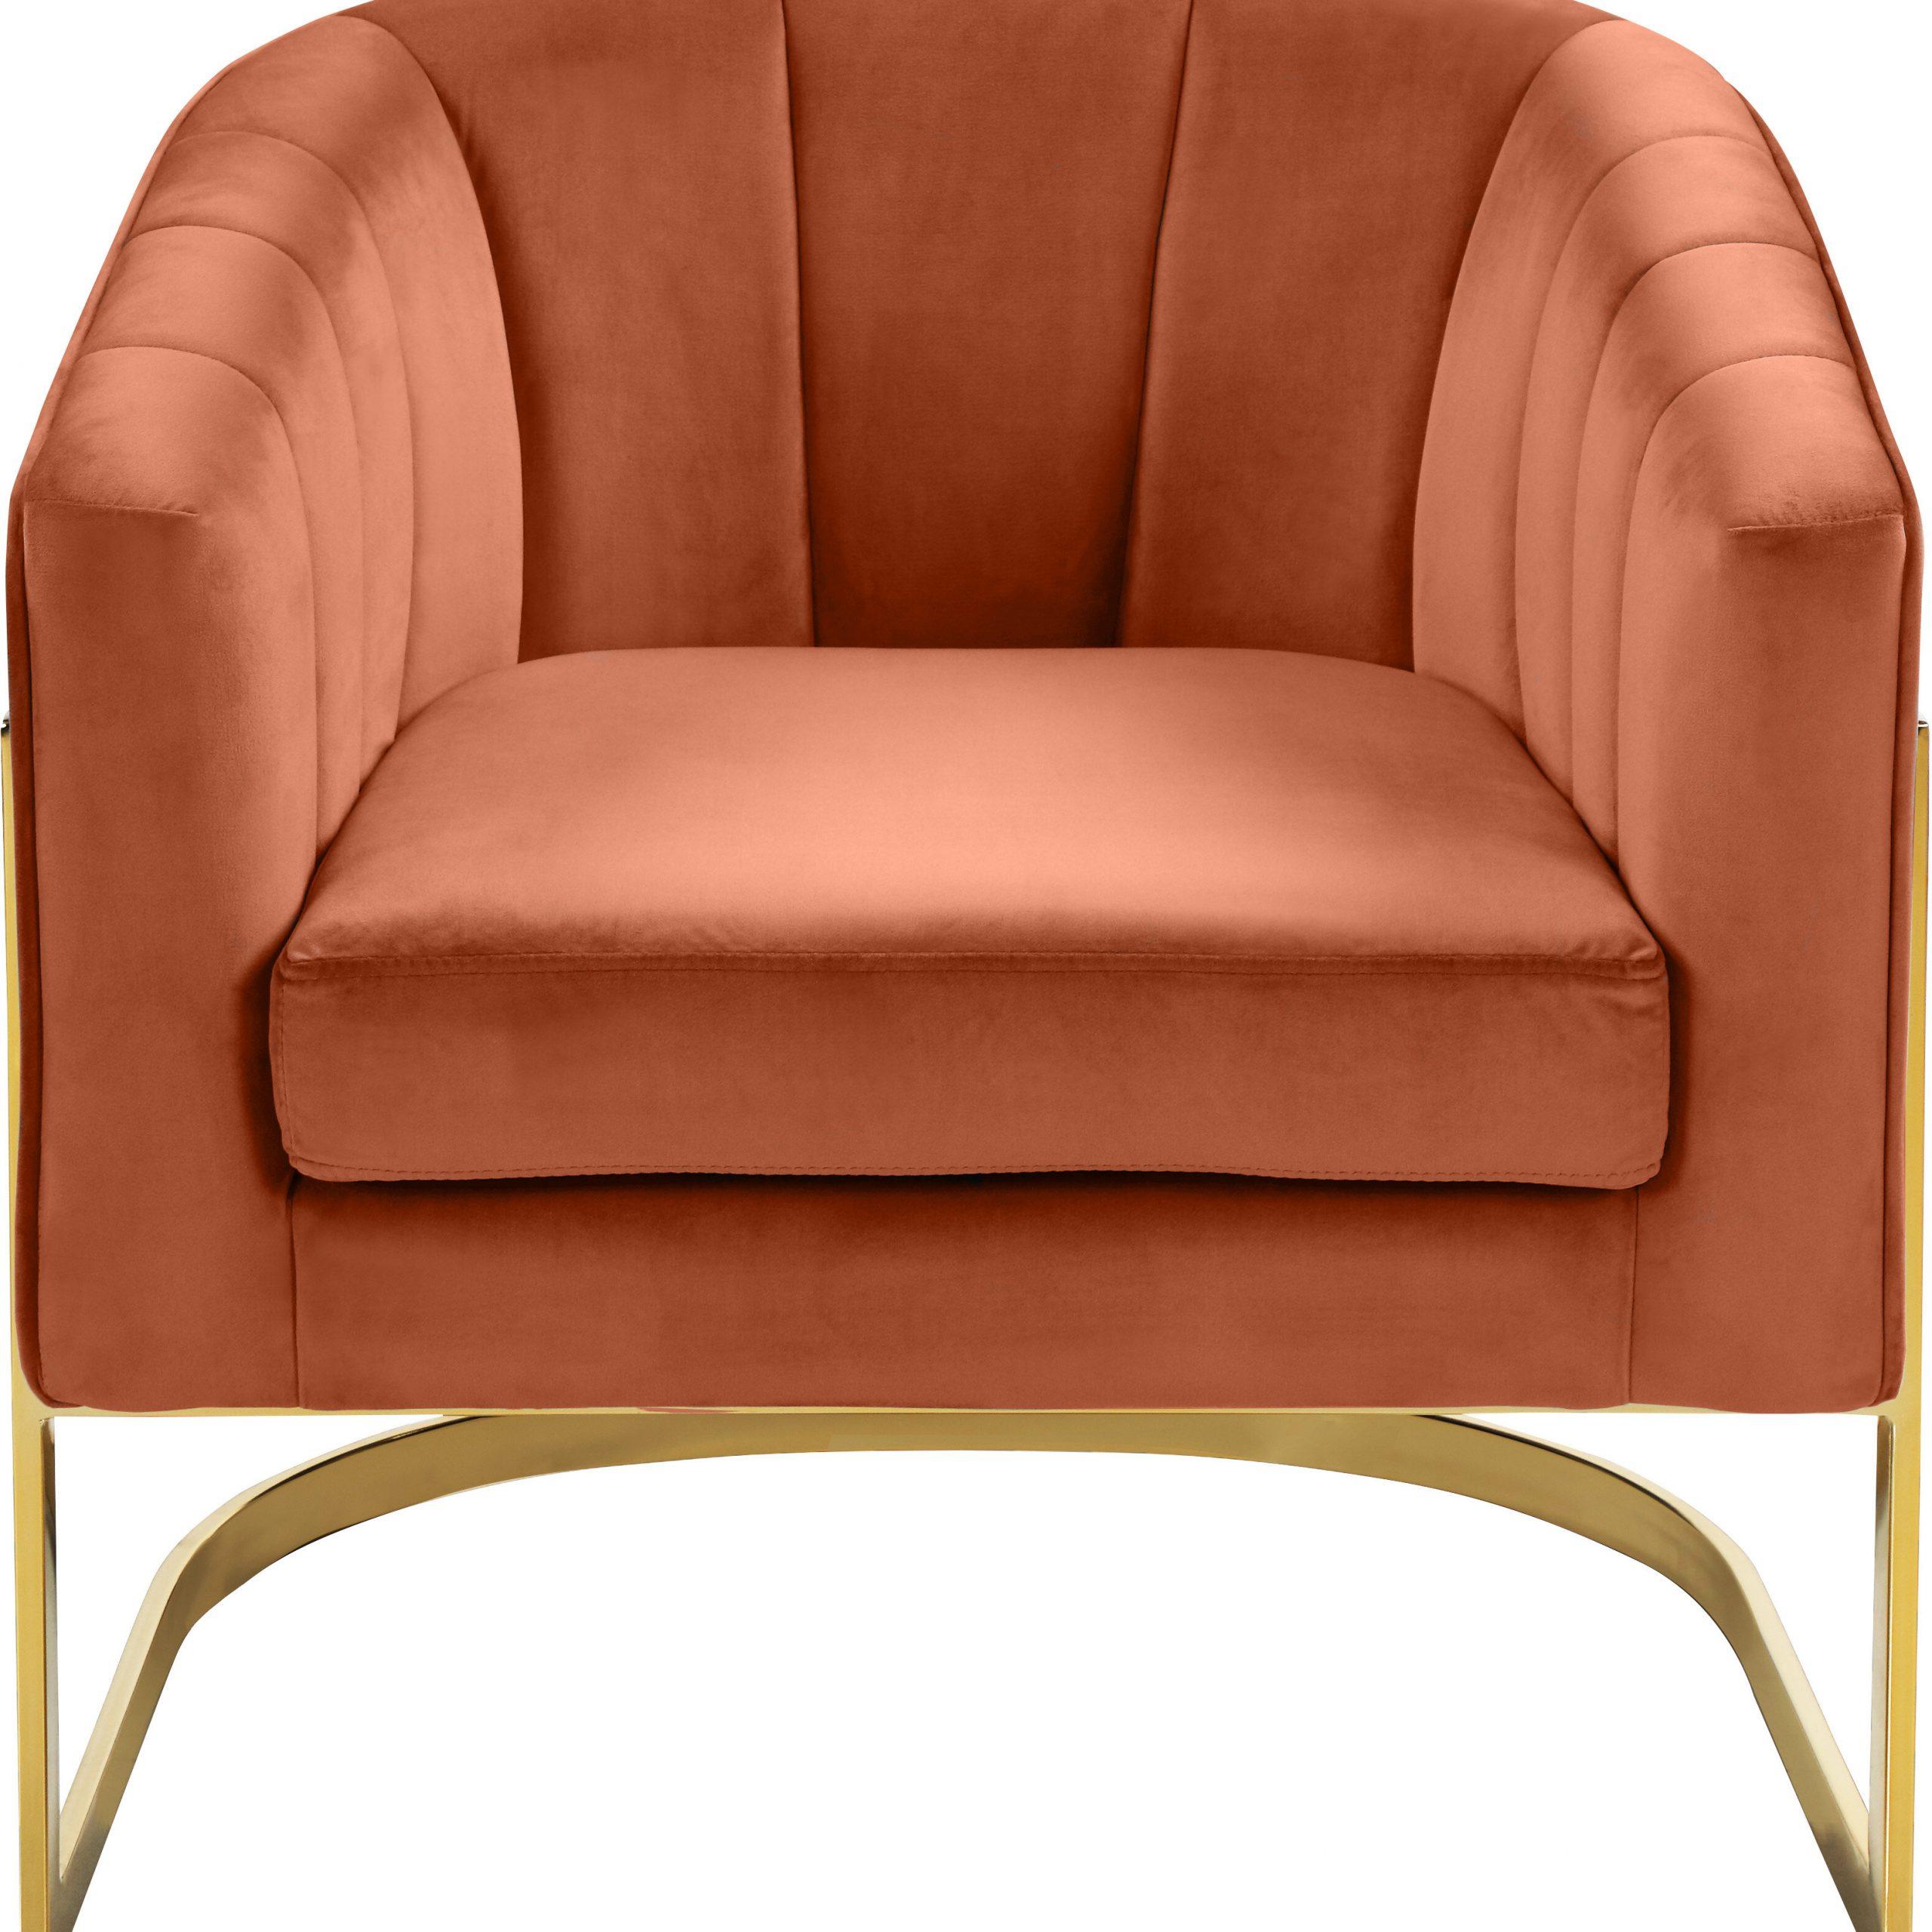 Wayfair Regarding Blaithin Simple Single Barrel Chairs (View 7 of 20)